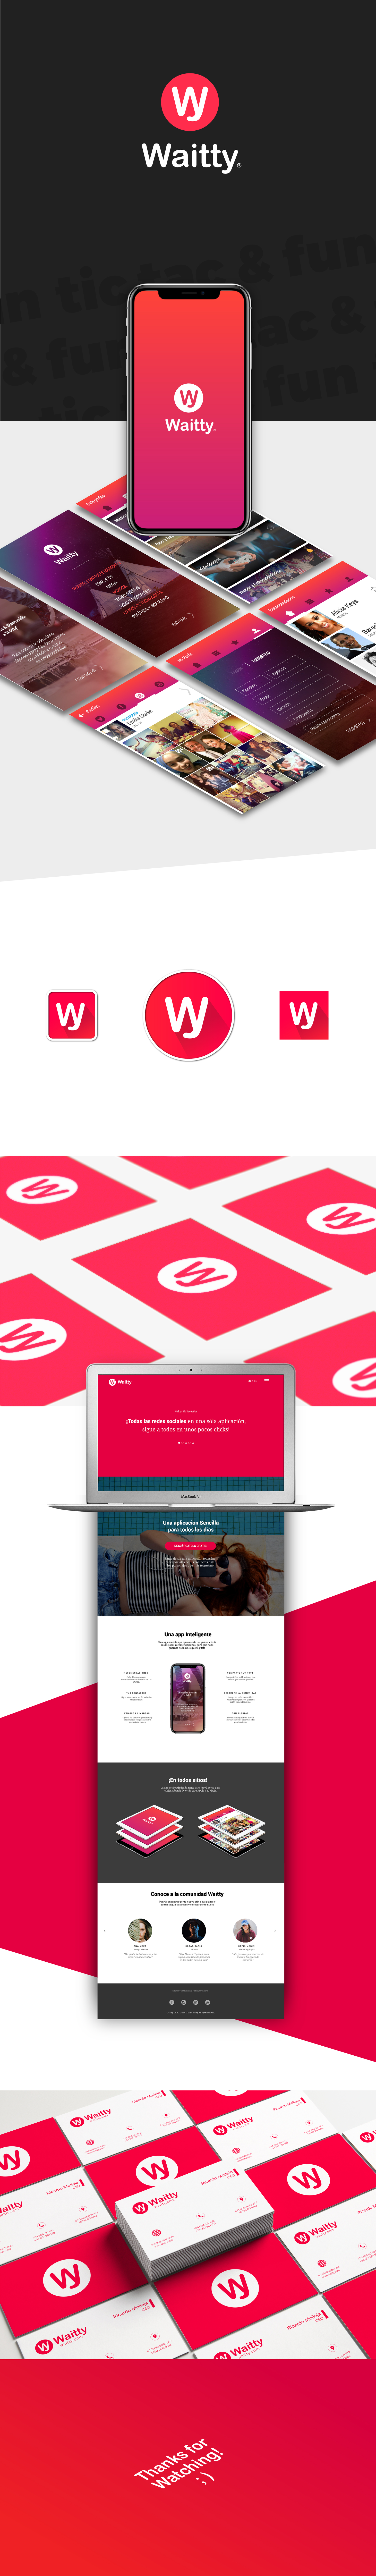 Branding y diseño web para Waitty por Binarid